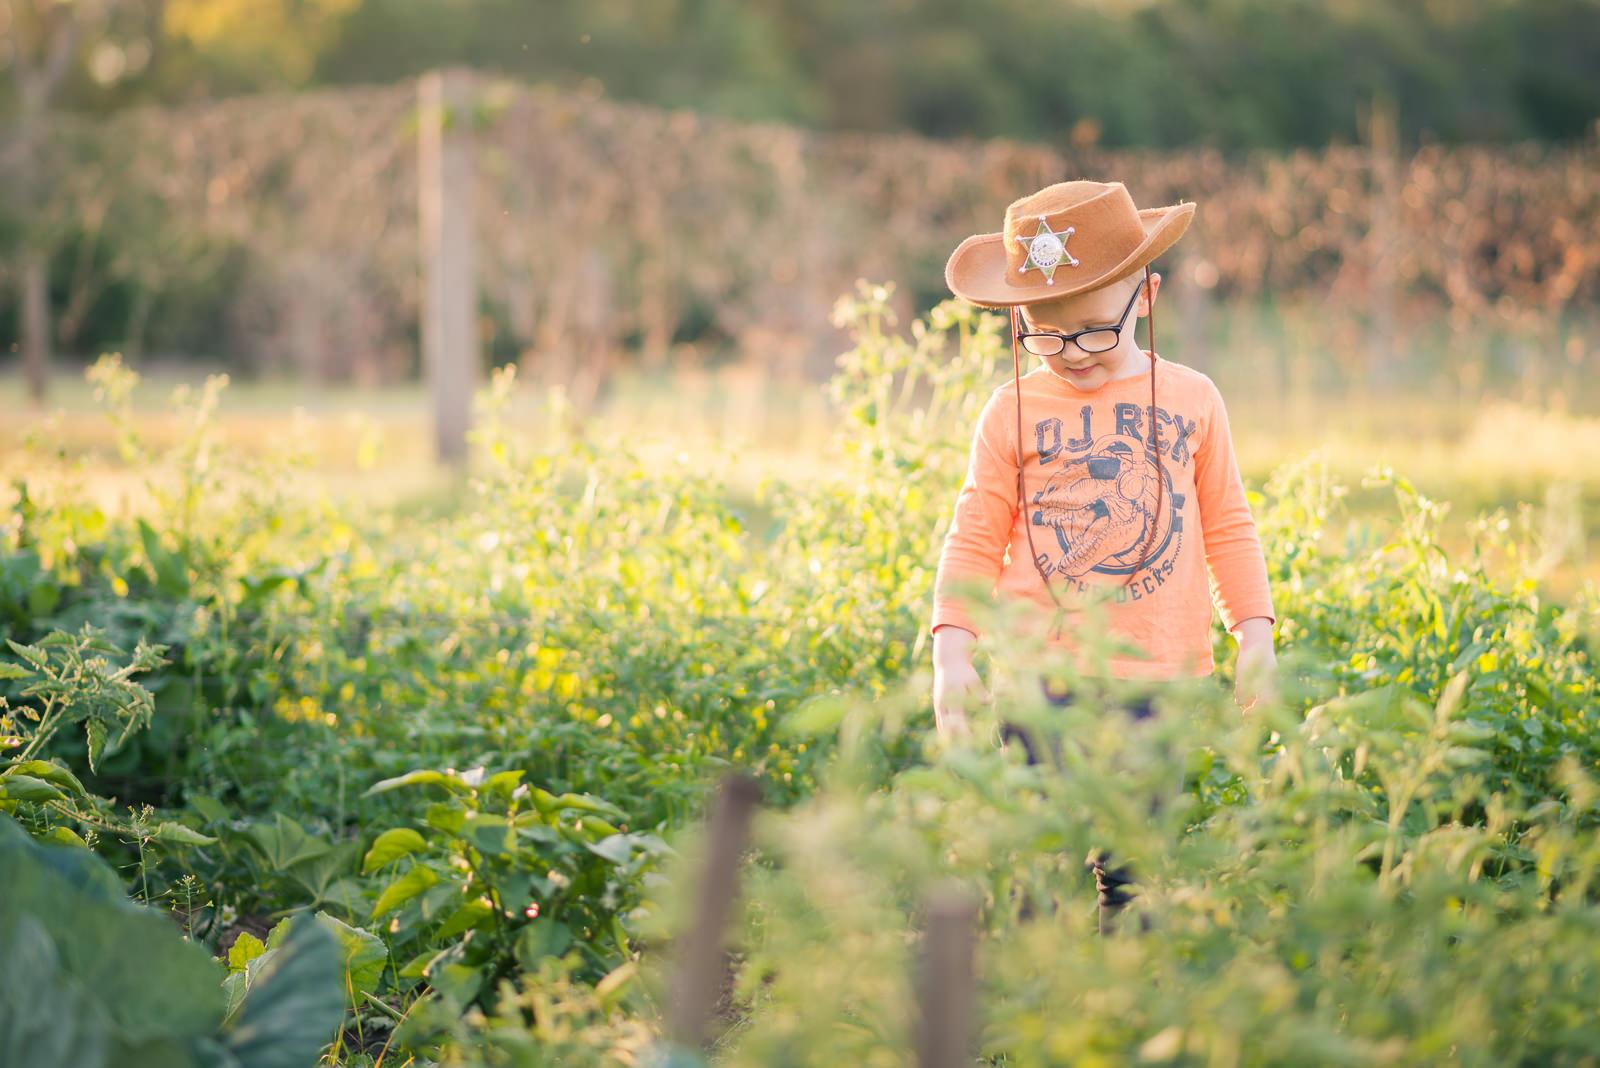 Portrait of little cowboy standing in vegetation in a rural setting in elimbah